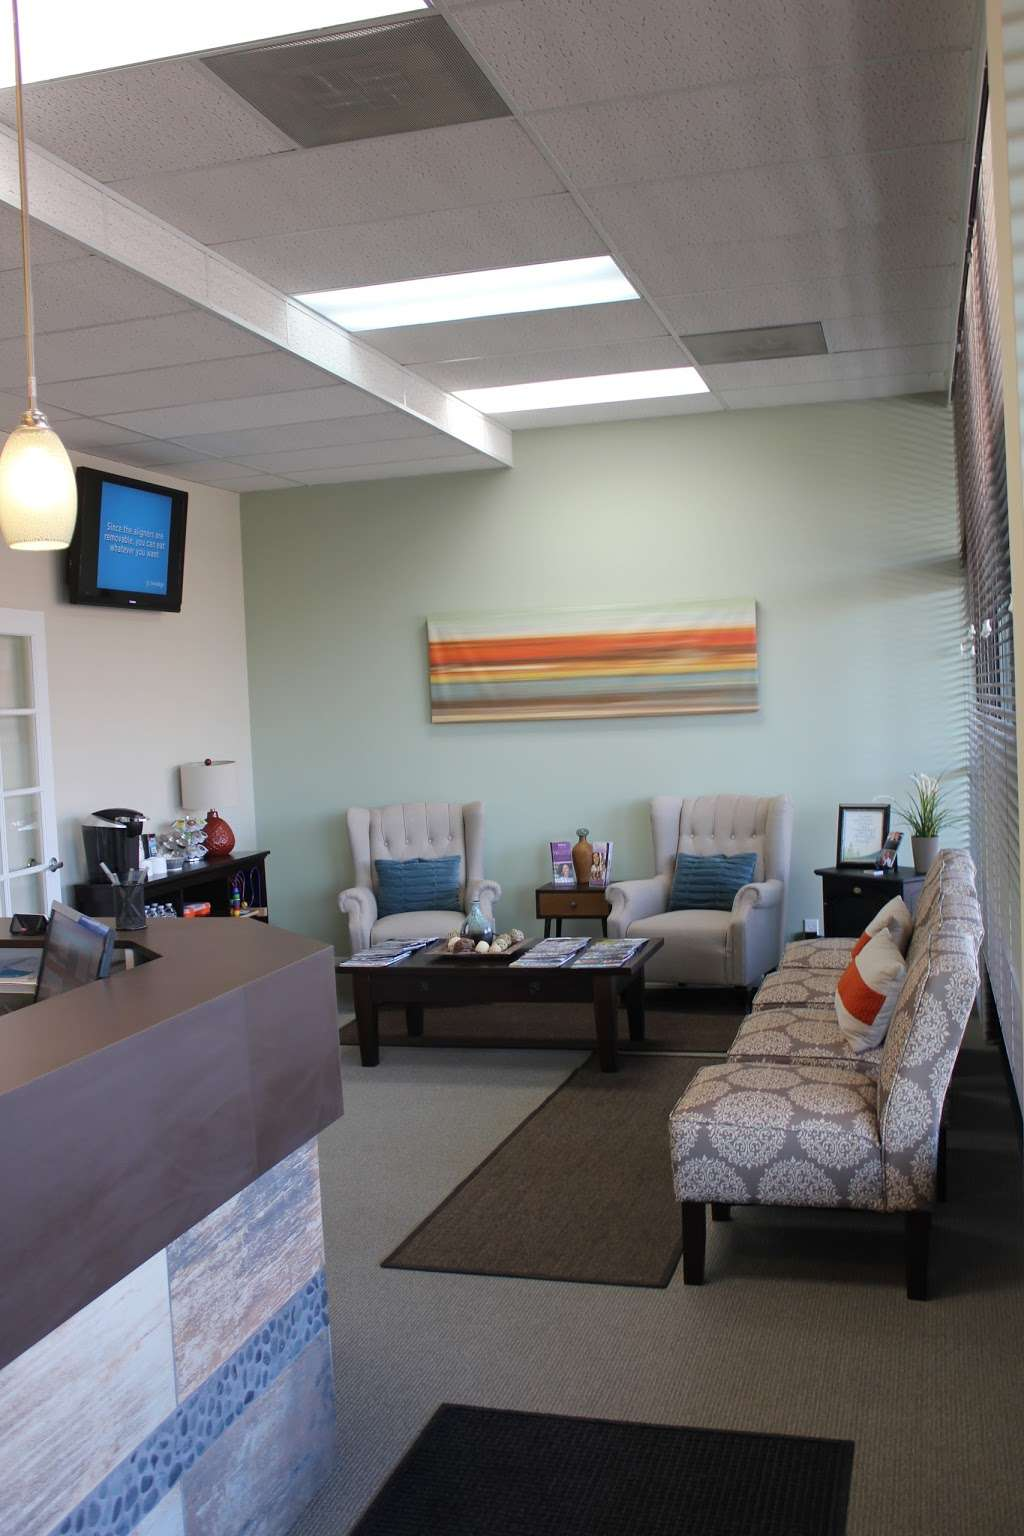 Piney Creek Family Dentistry - dentist  | Photo 6 of 10 | Address: 15430 E Orchard Rd, Centennial, CO 80016, USA | Phone: (303) 699-4822